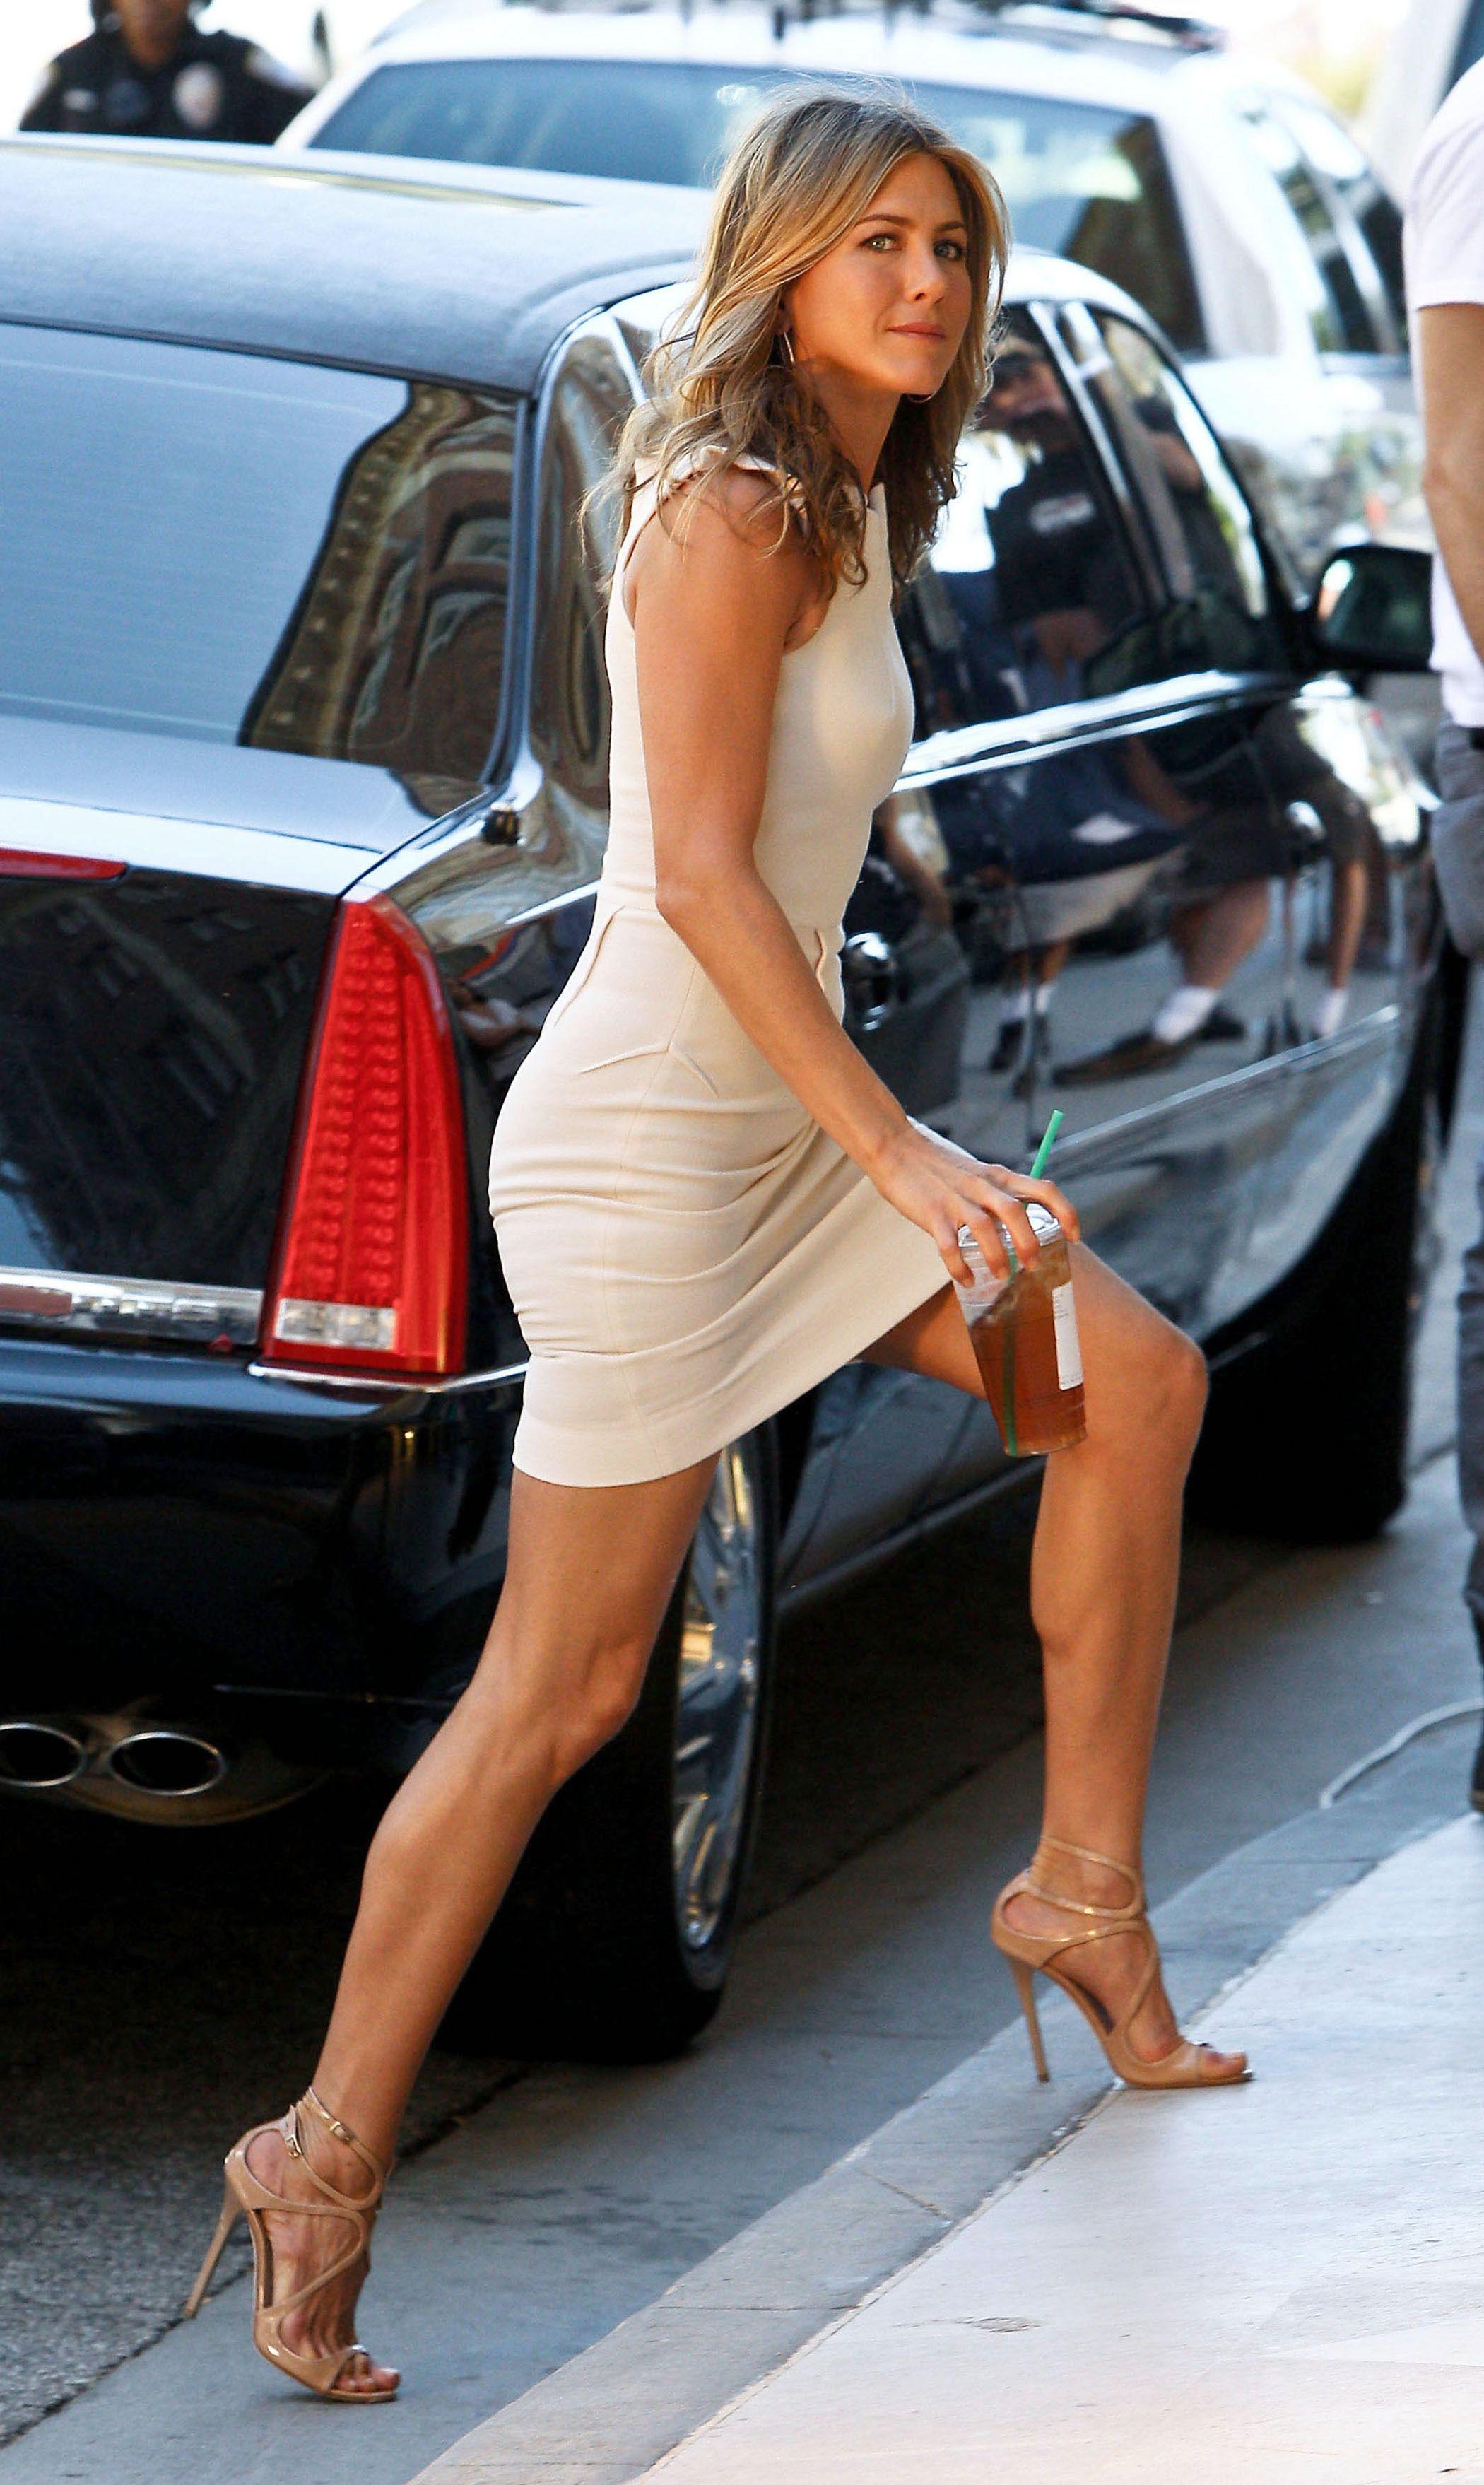 Jennifer aniston nice ass girl